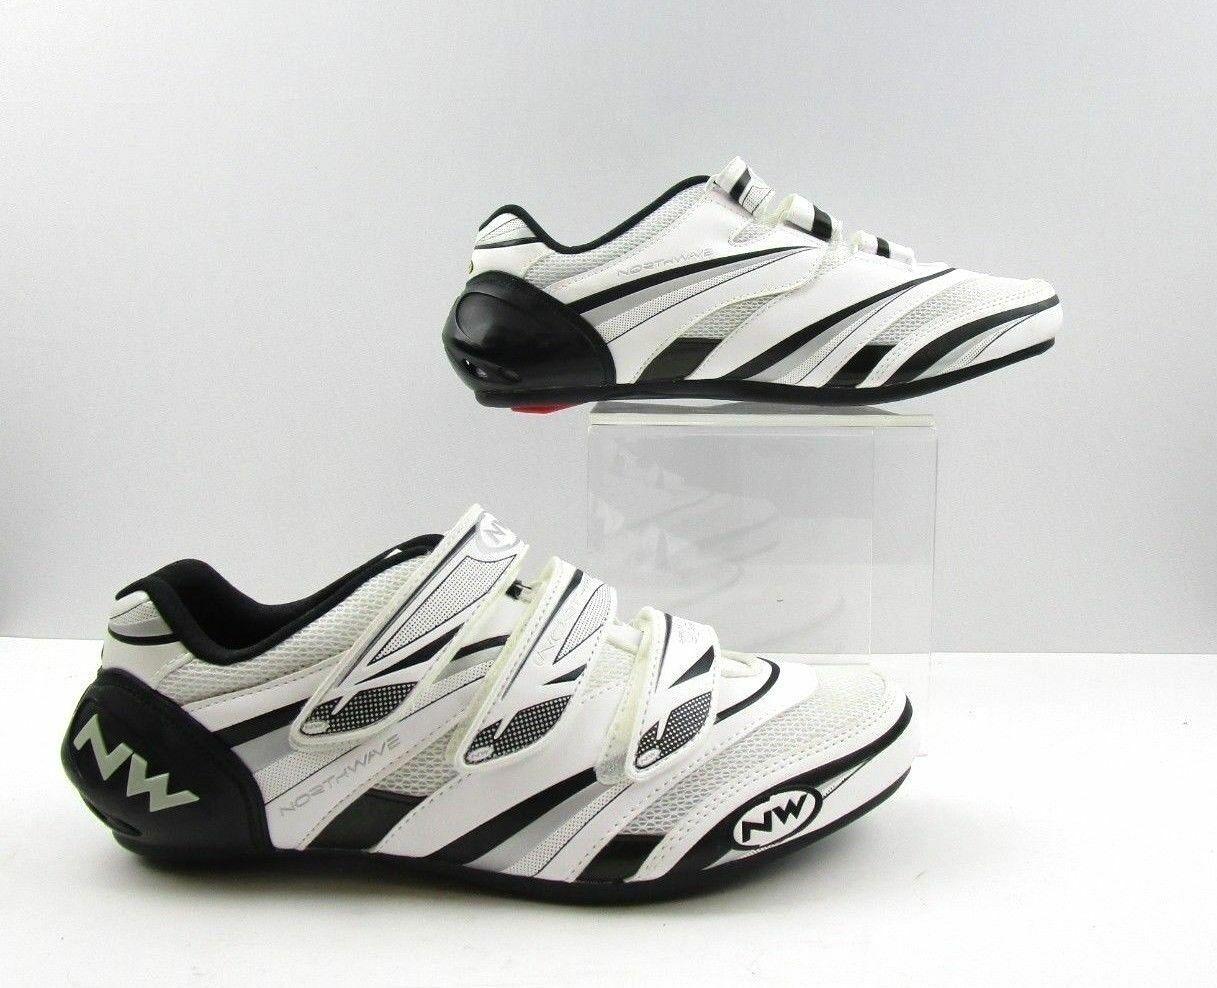 Men's Northwave bianca verdeigo Pro 2011 Biking Cycling scarpe Dimensione  12